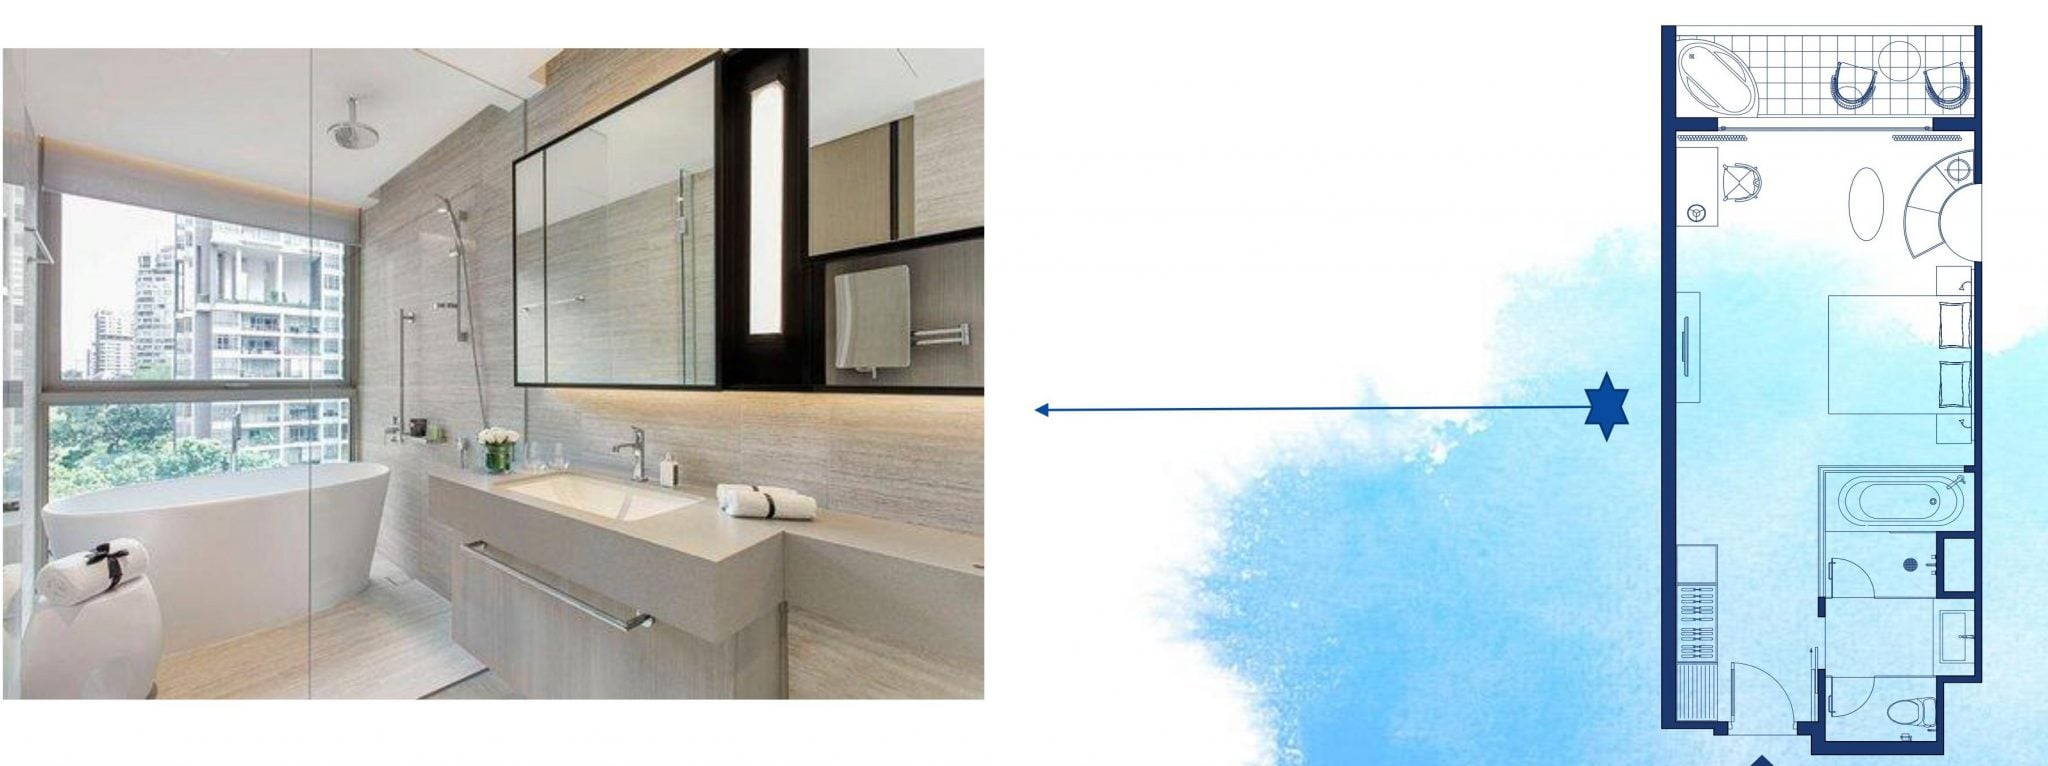 0048 e1563265755470 - Dự án căn hộ condotel Cam Ranh Bay - Pearl Cam Ranh